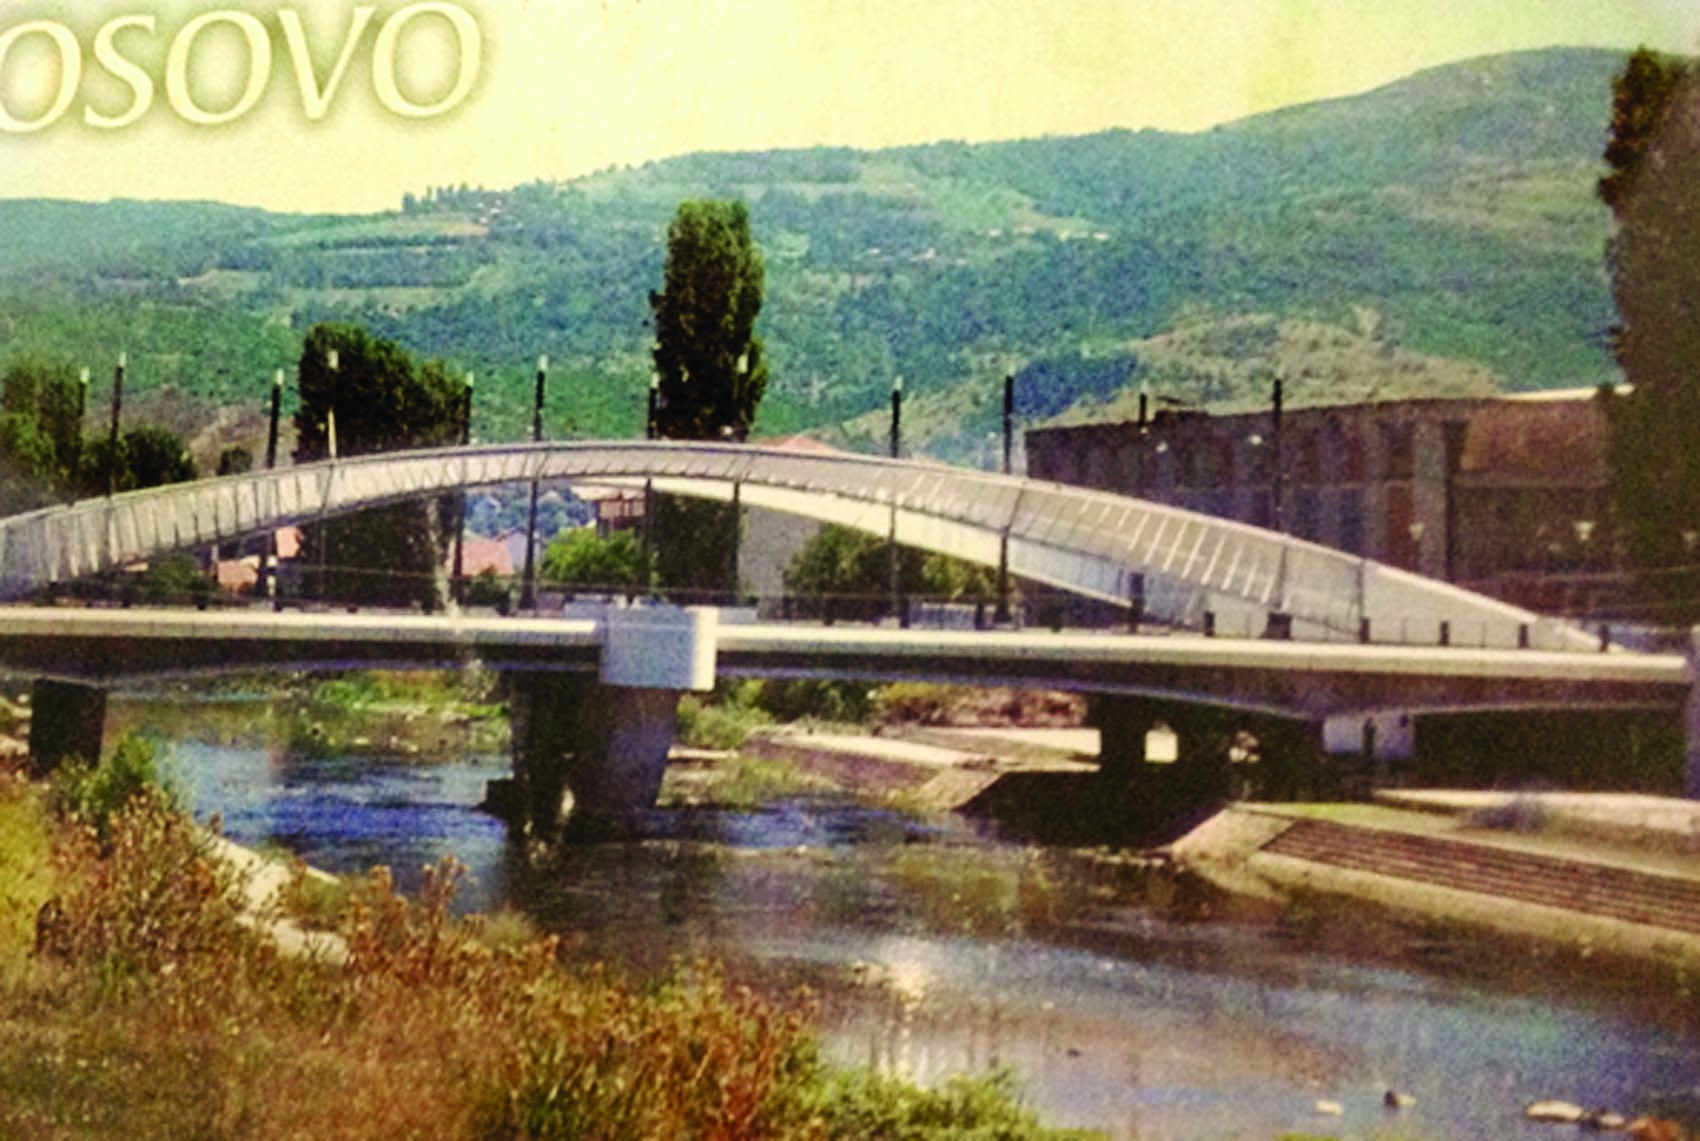 Kosovoalban skots till dods i mitrovica